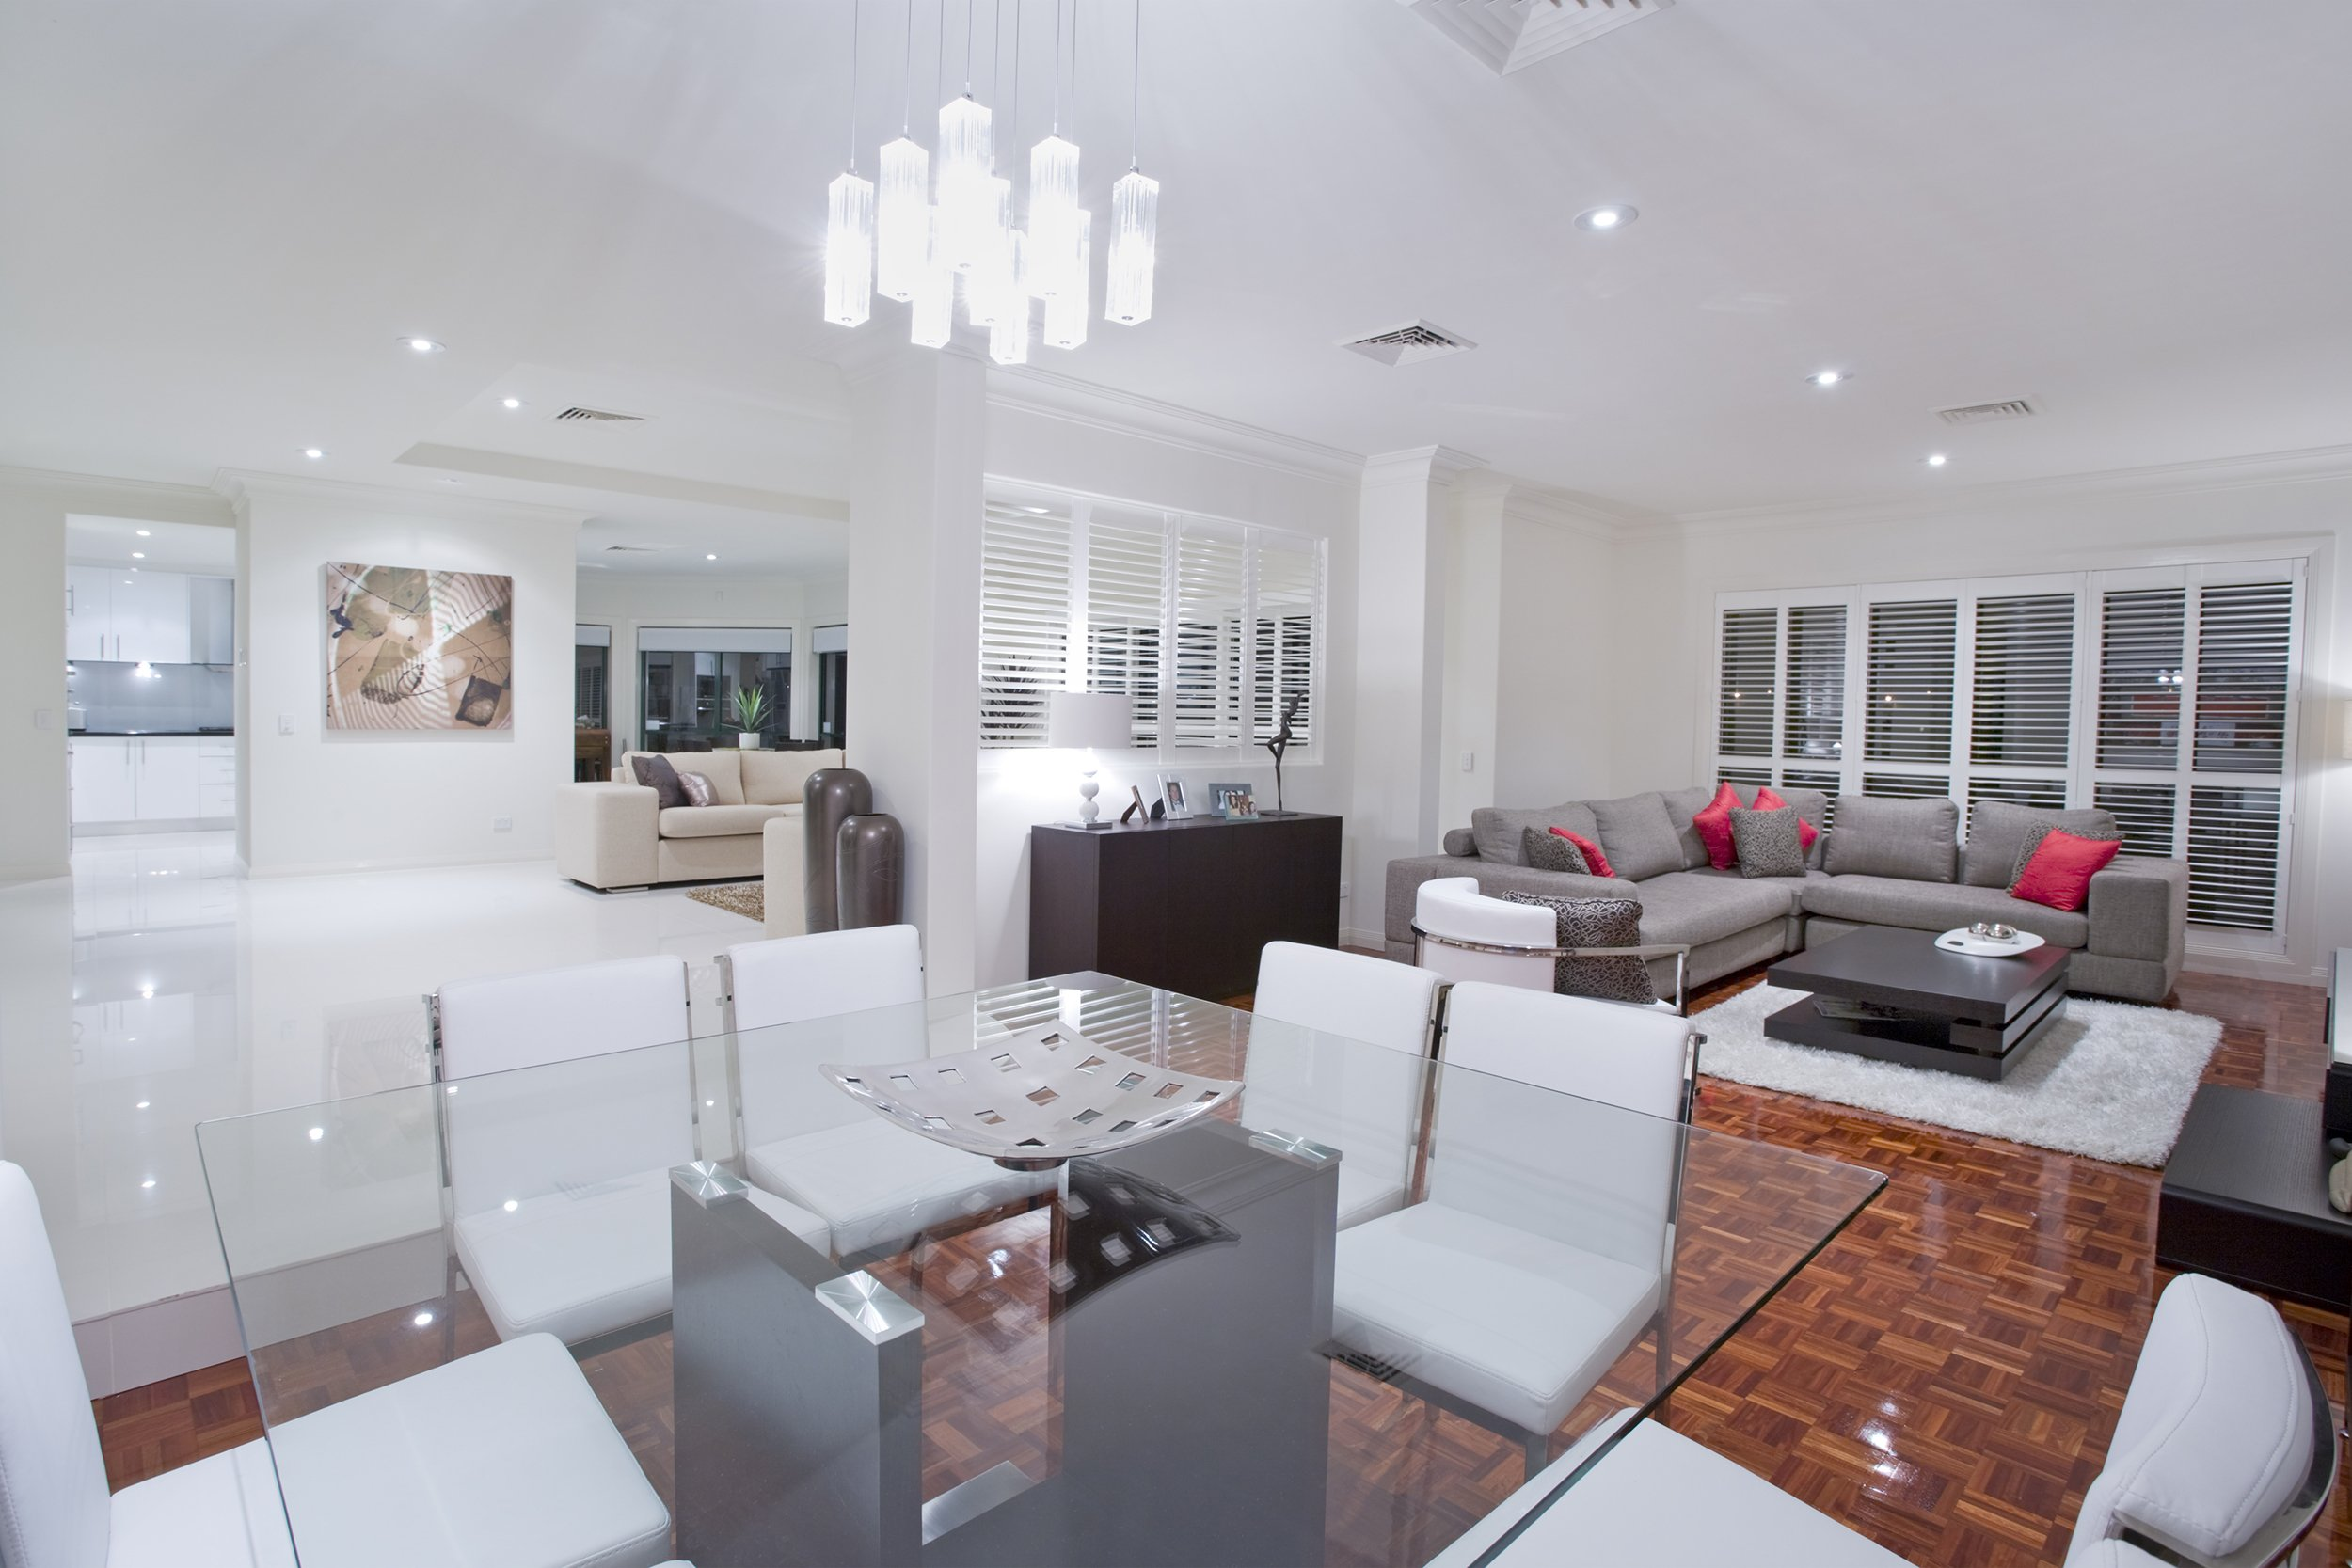 Aran acja salonu kuchni jadalni dodatki do domu for Piani di casa con soggiorno formale e sale da pranzo